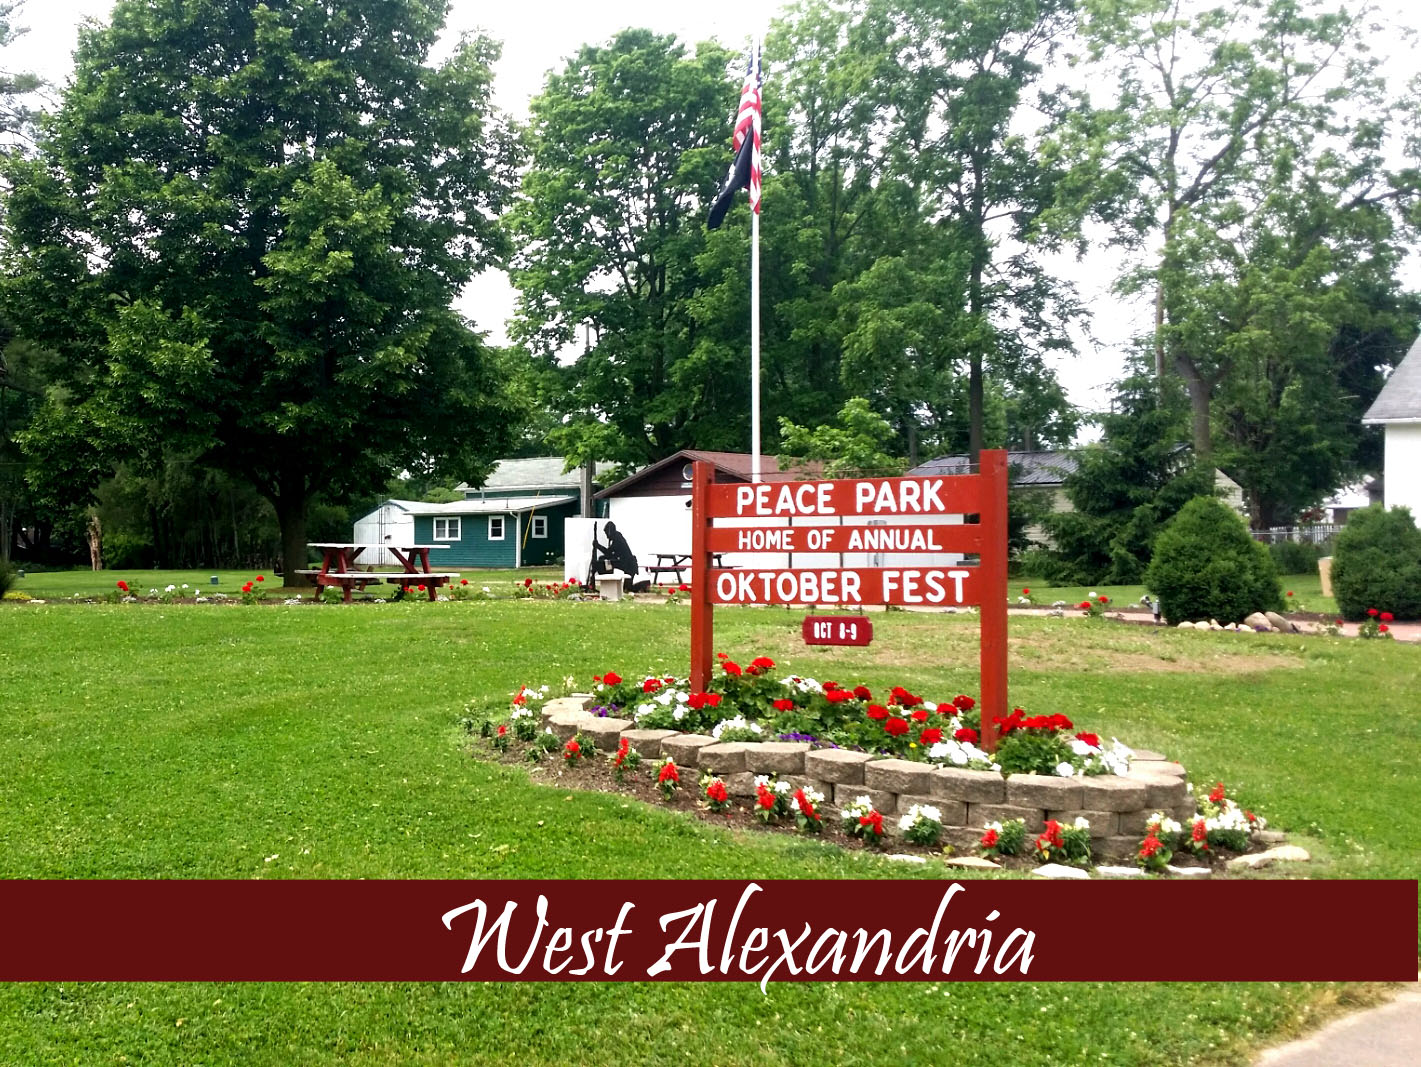 West Alexandria